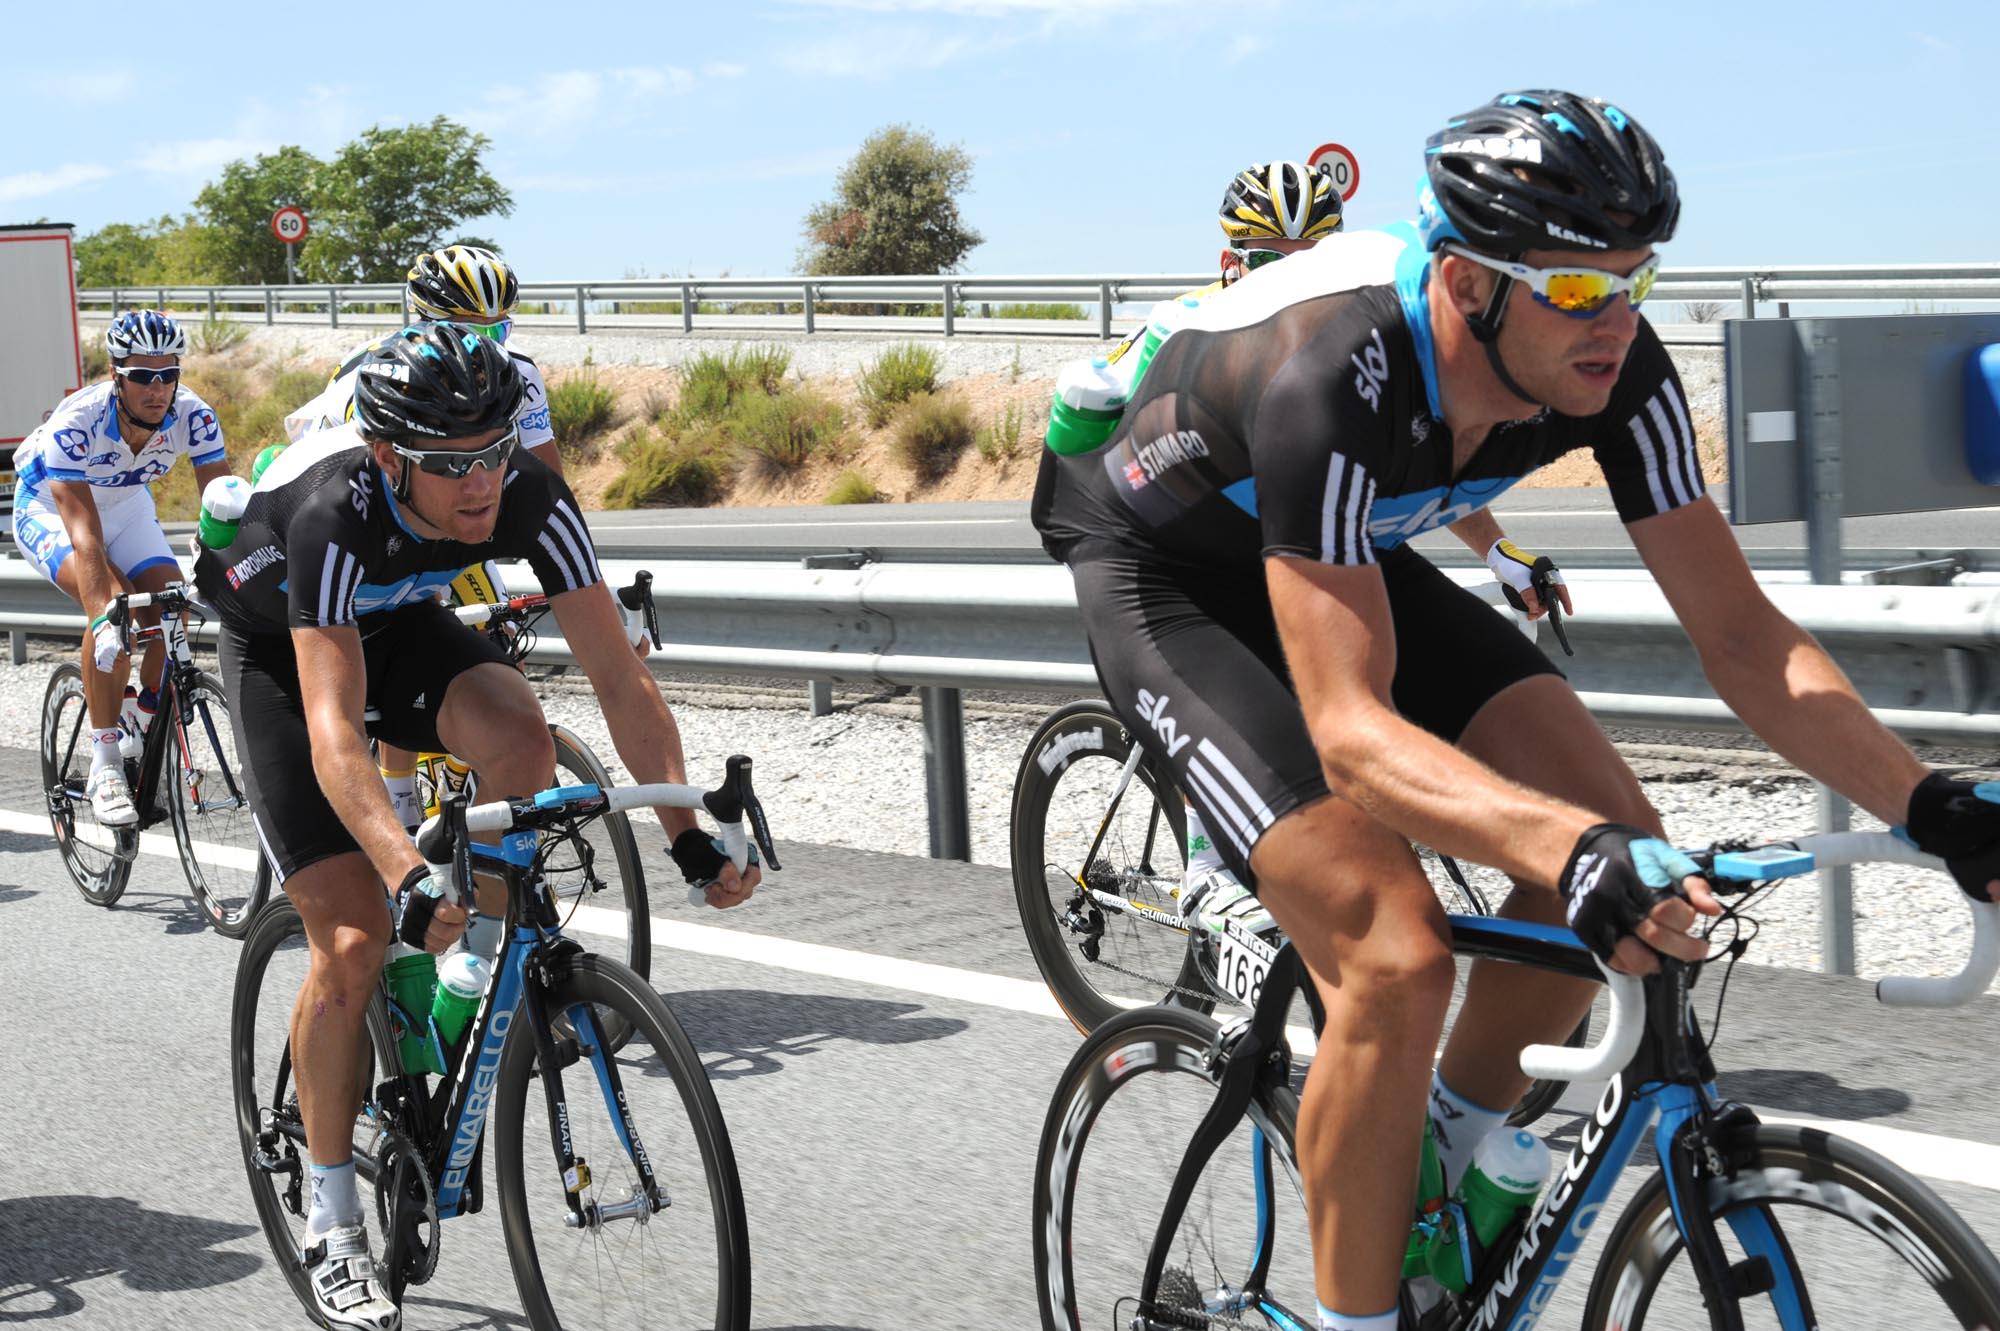 Ian Stannard, Vuelta a Espana 2010, stage five